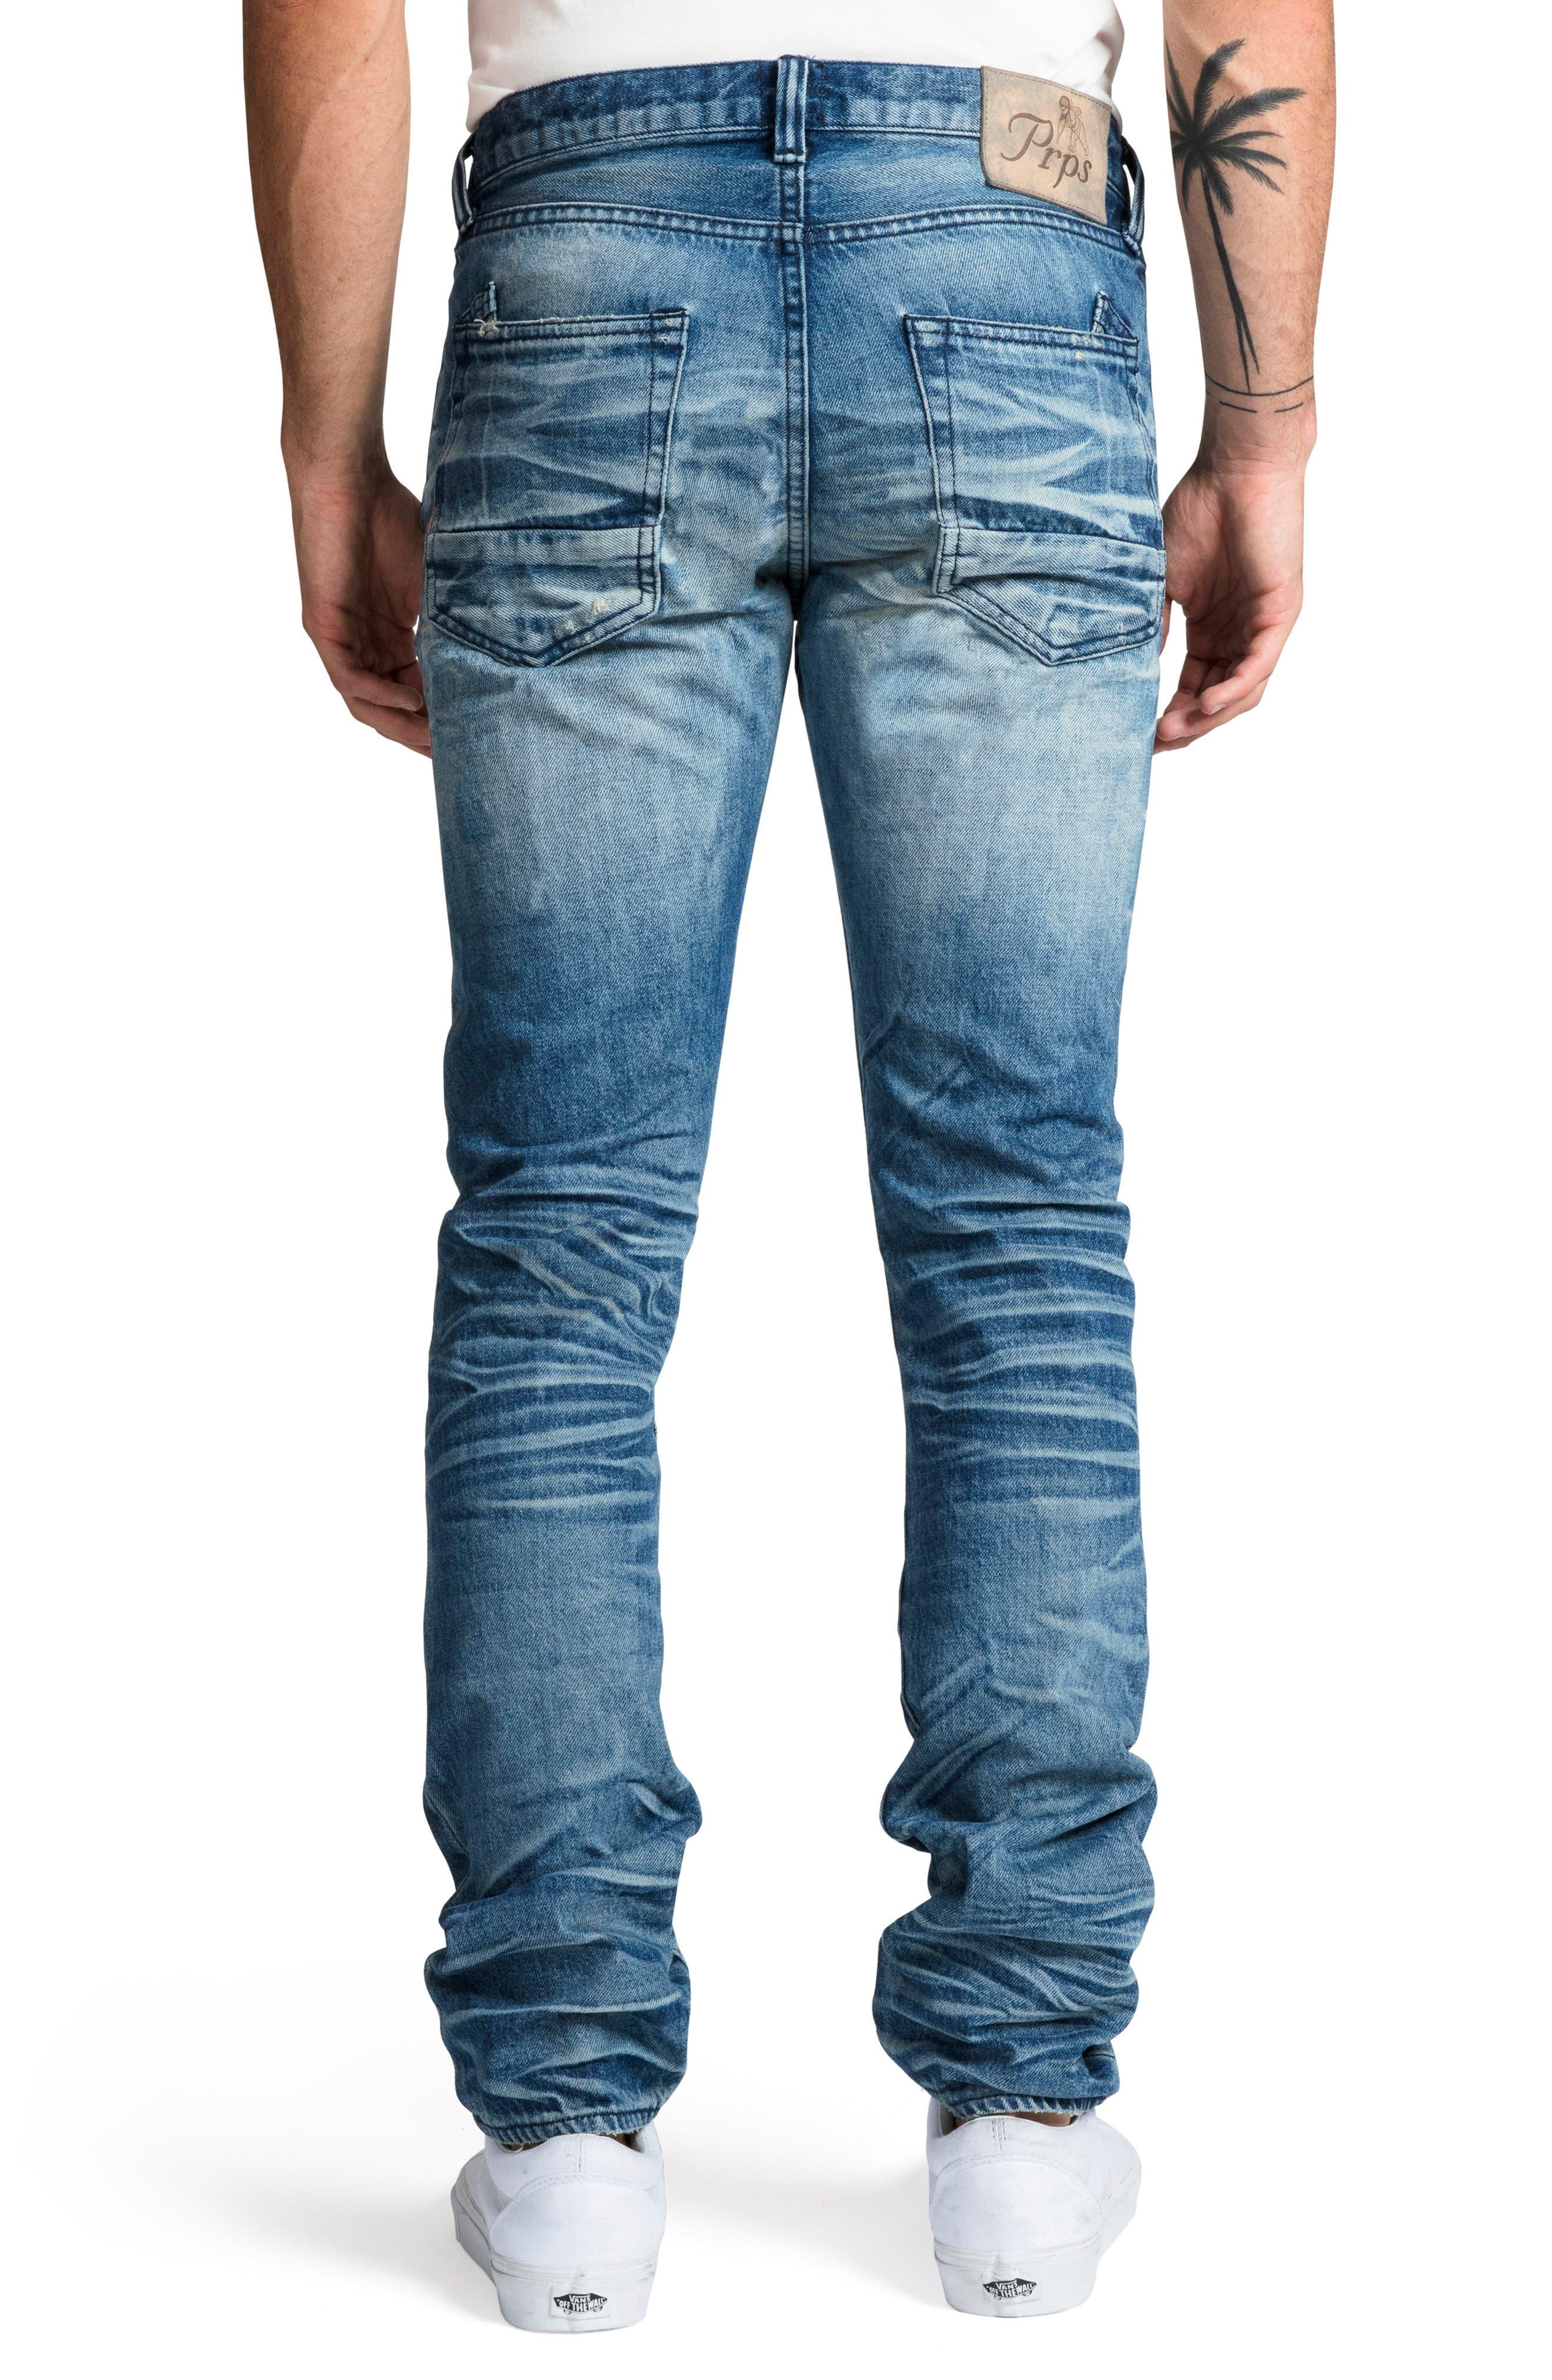 Le Sabre Slim Fit Jeans,                             Alternate thumbnail 2, color,                             COOING